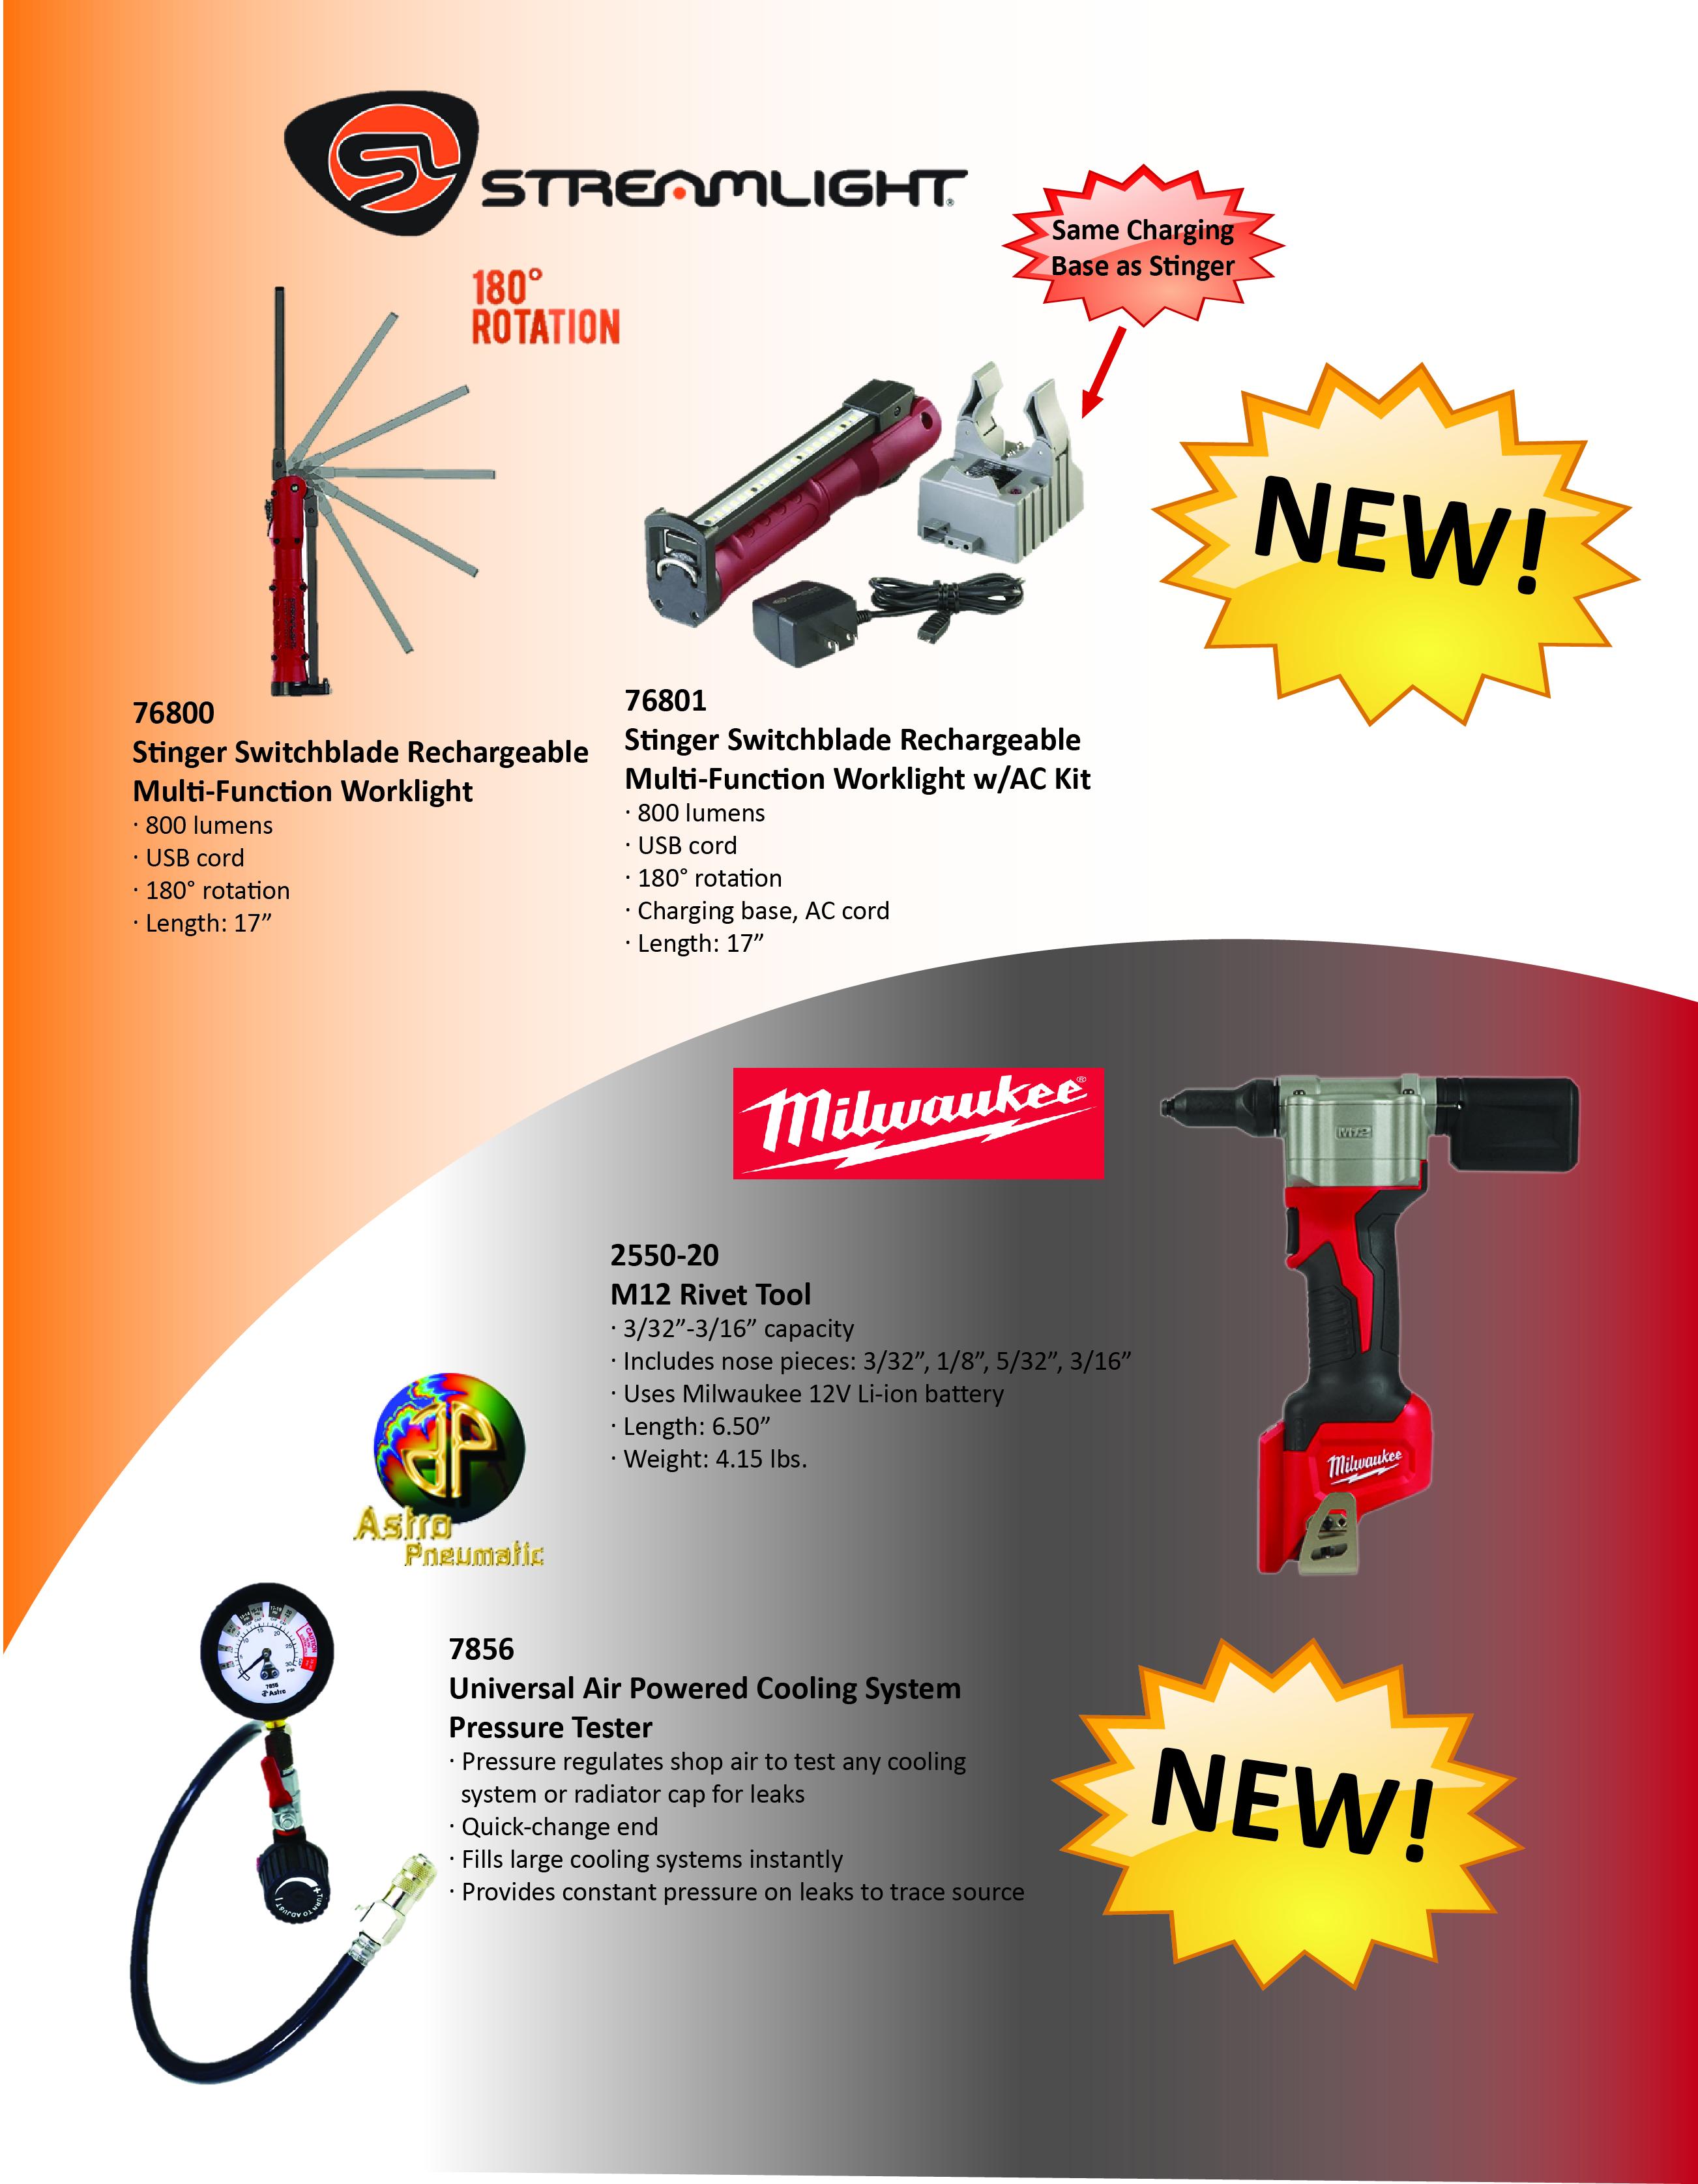 5 3 Streamlight Astro Milwaukee - Gezon Tool